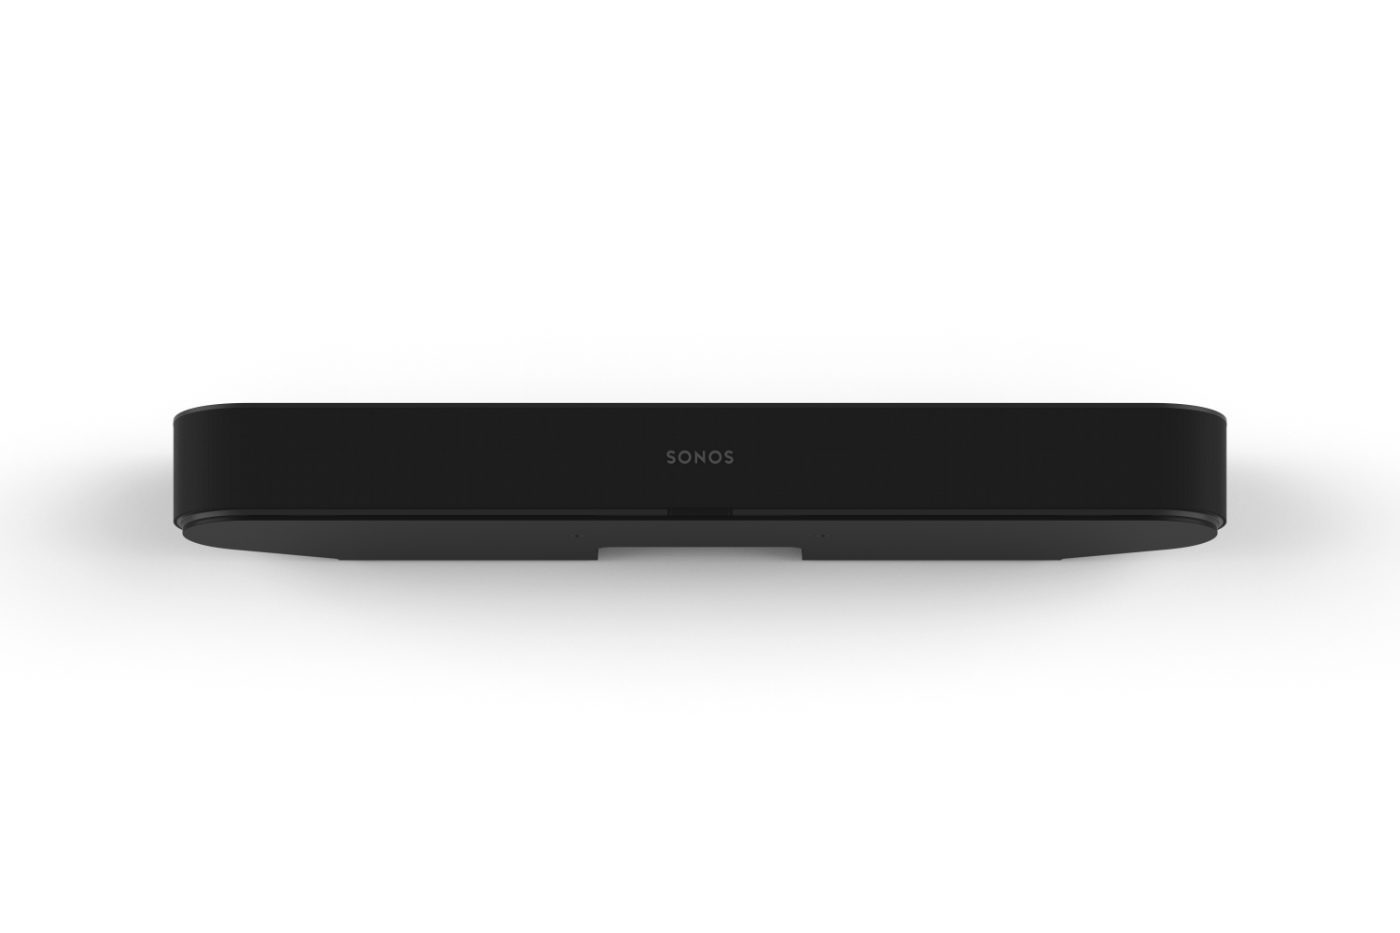 Beam_Black-Product_Render-Front-Underside-FY19_MST-MST_fid32794